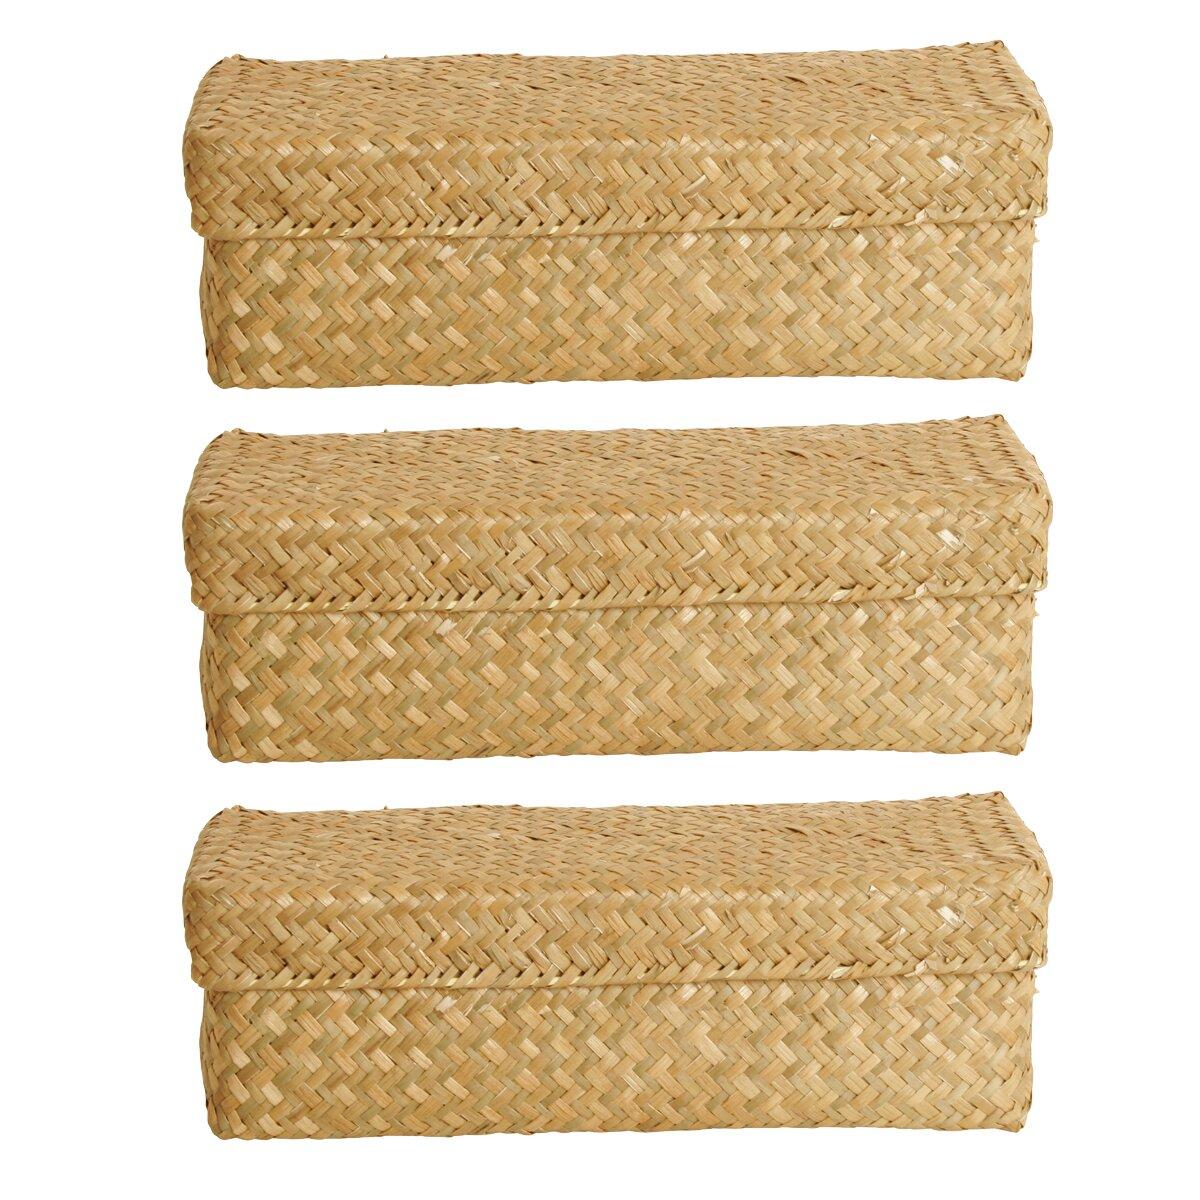 3 Piece Natural Seagrass Reed Basket Set